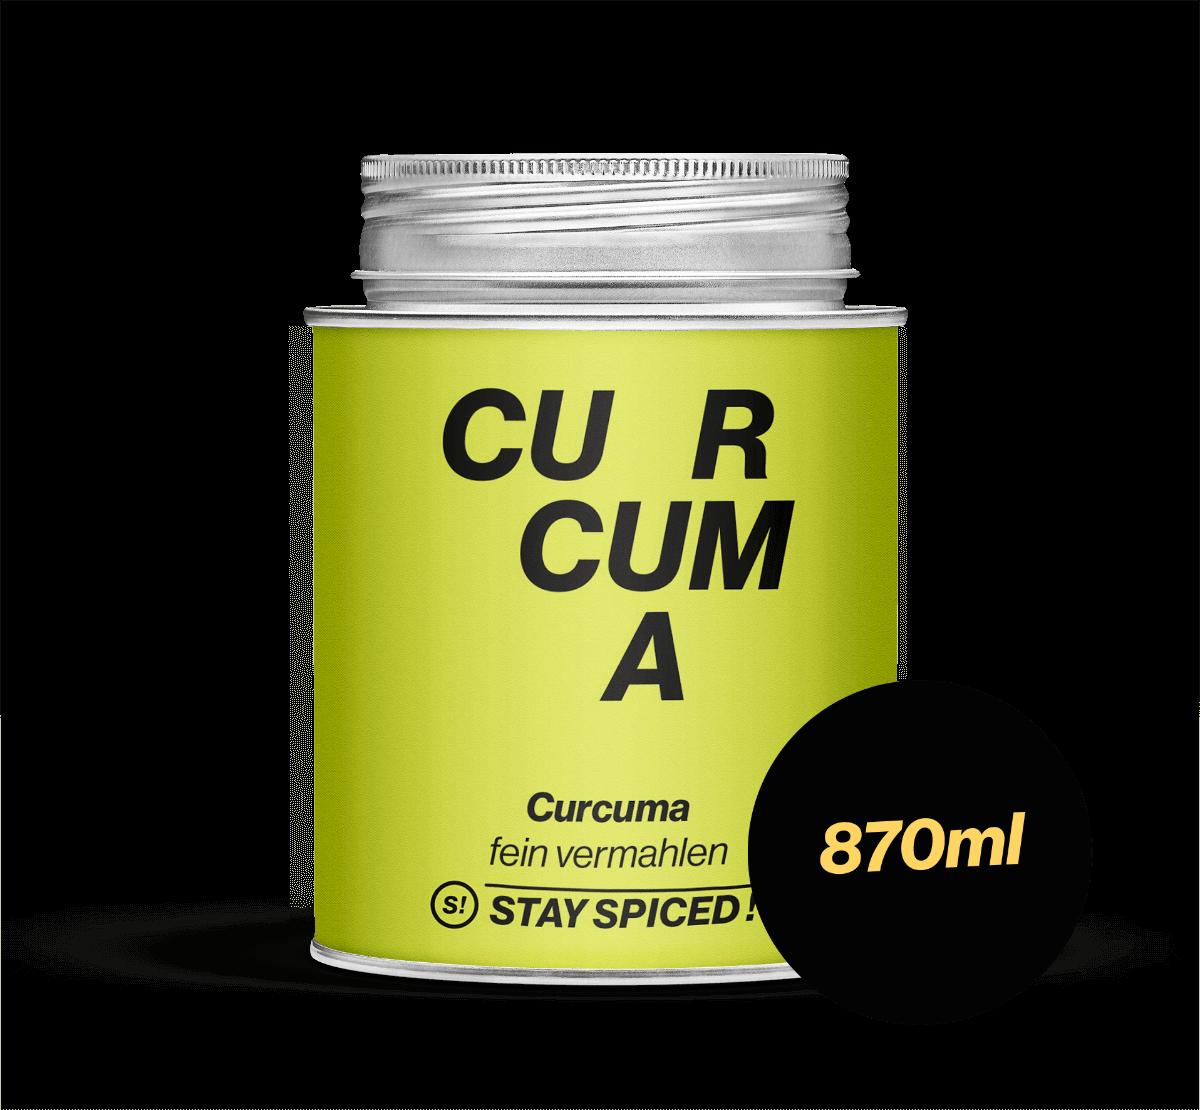 Curcuma - Gelbwurz - gemahlen, 870 ml Schraubdose 870ml Schraubdose